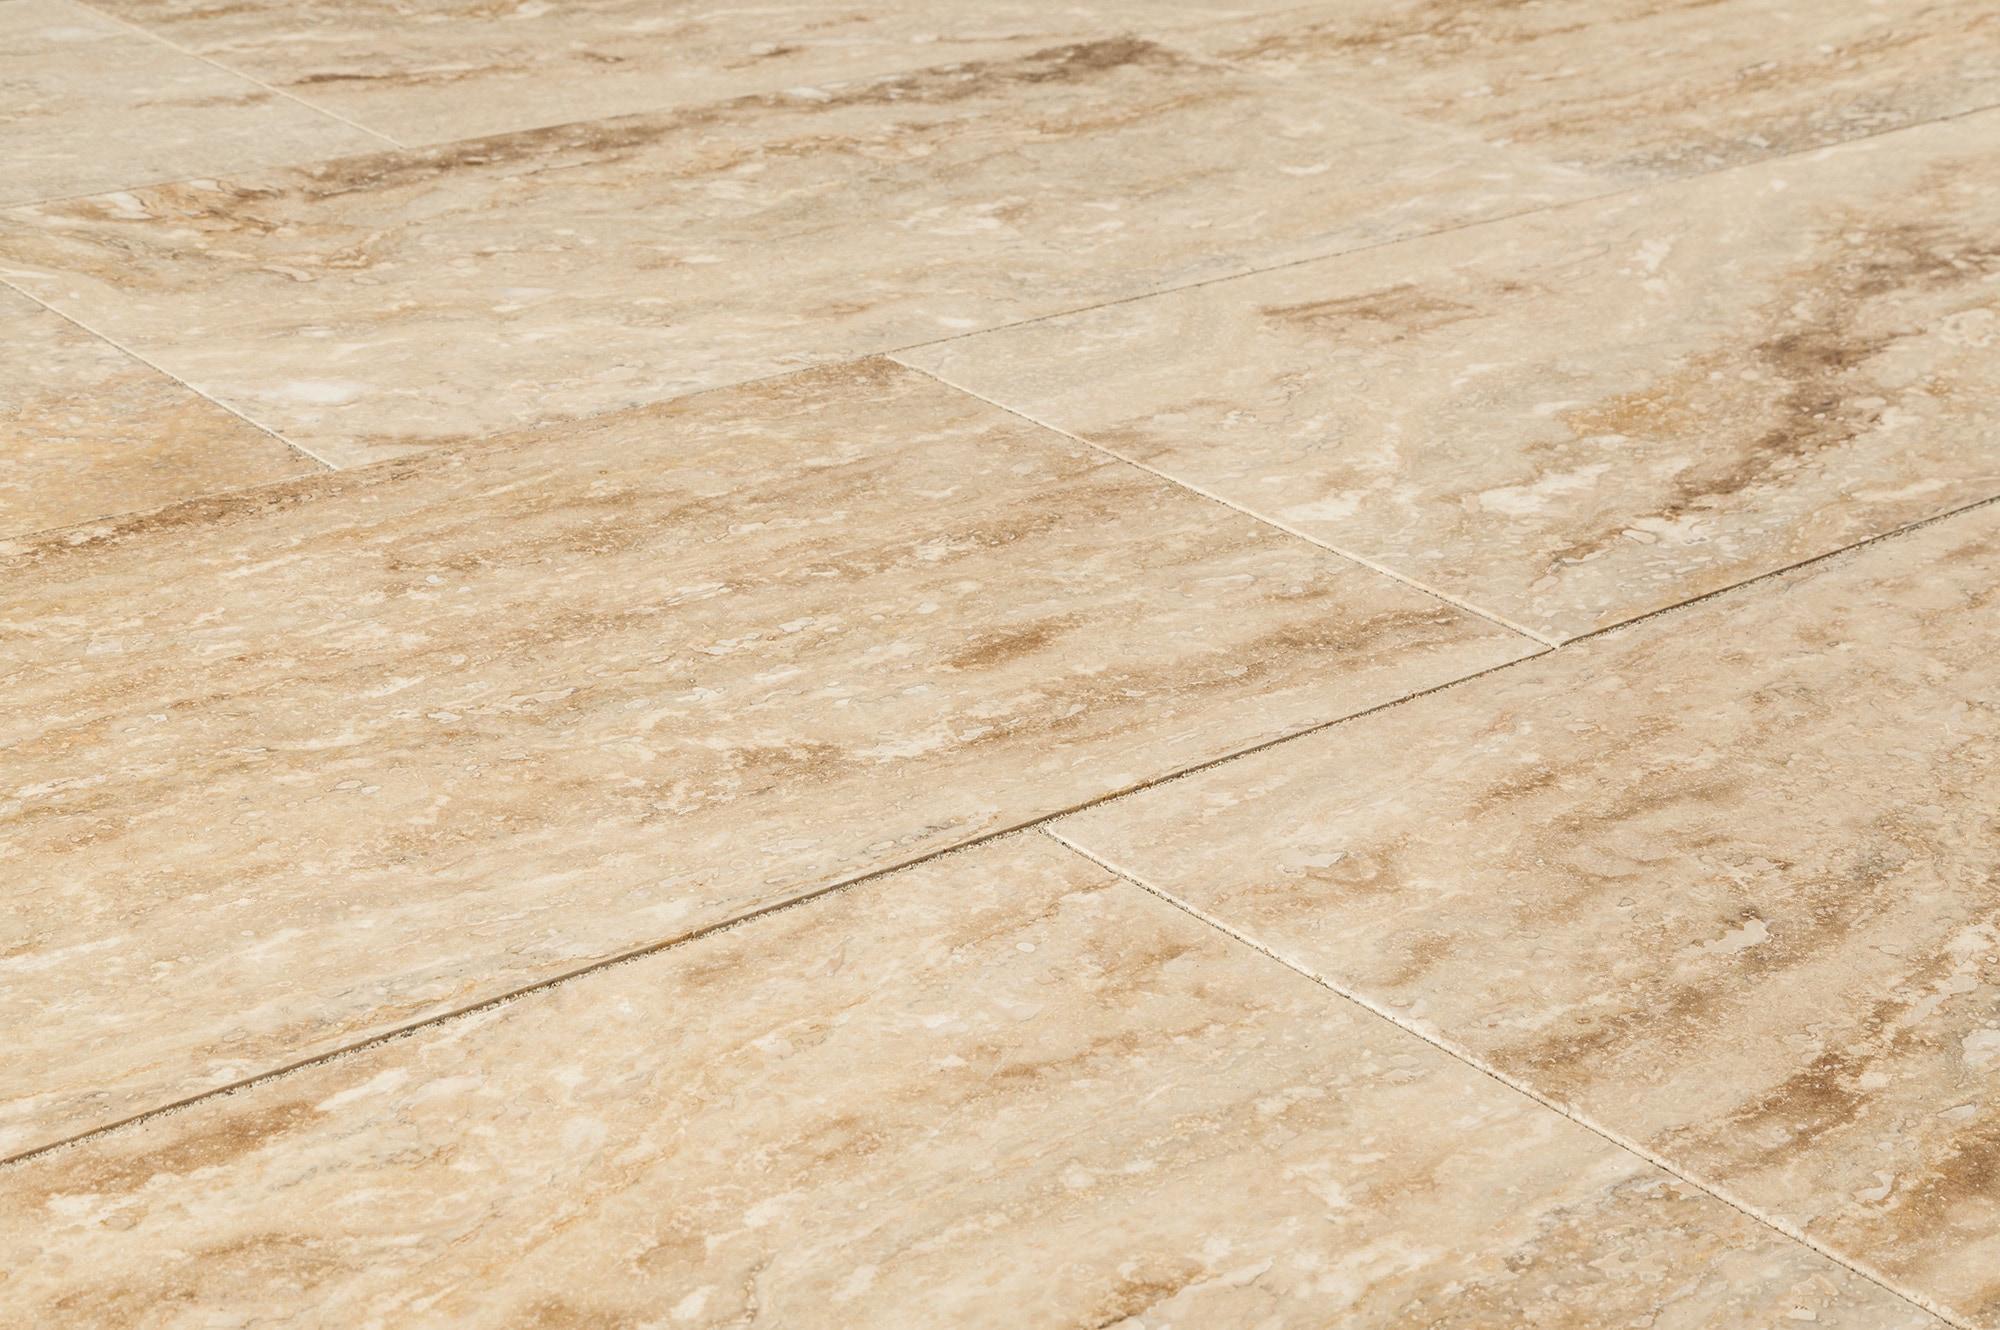 Polished Travertine Floor Tile Images Merida